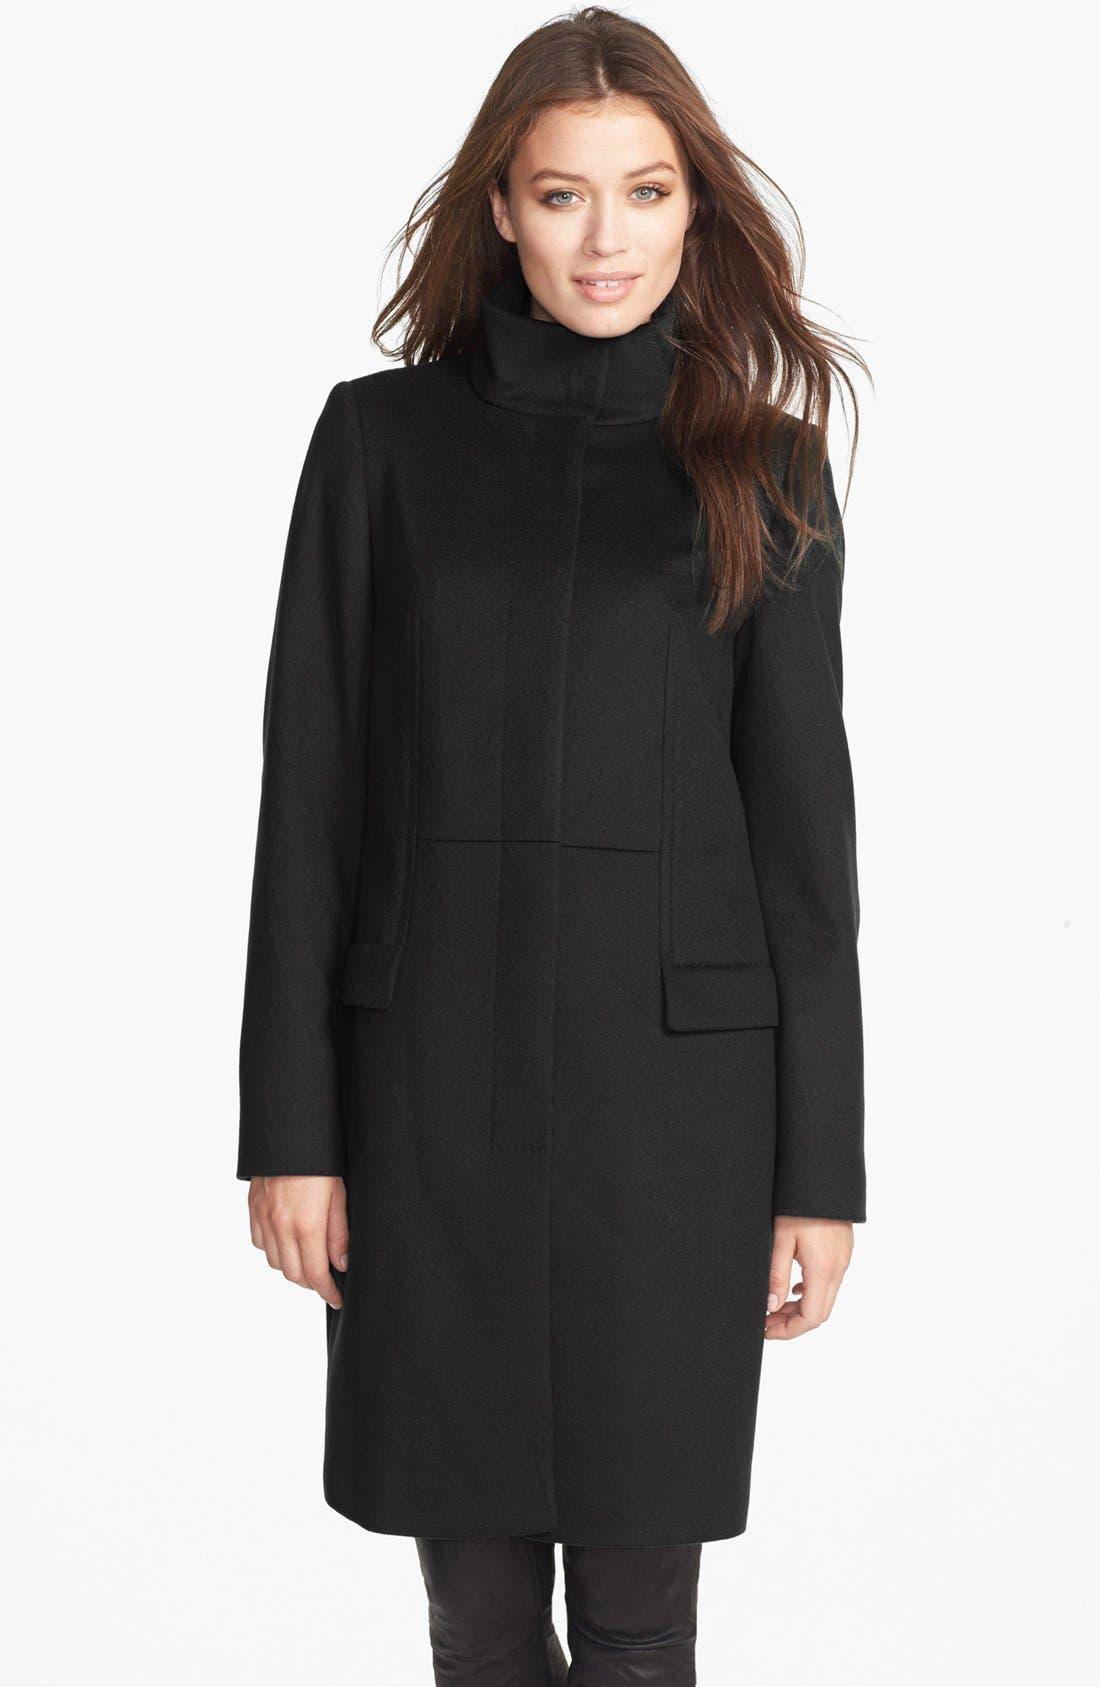 Main Image - BOSS HUGO BOSS 'Celira' Wool & Cashmere Coat